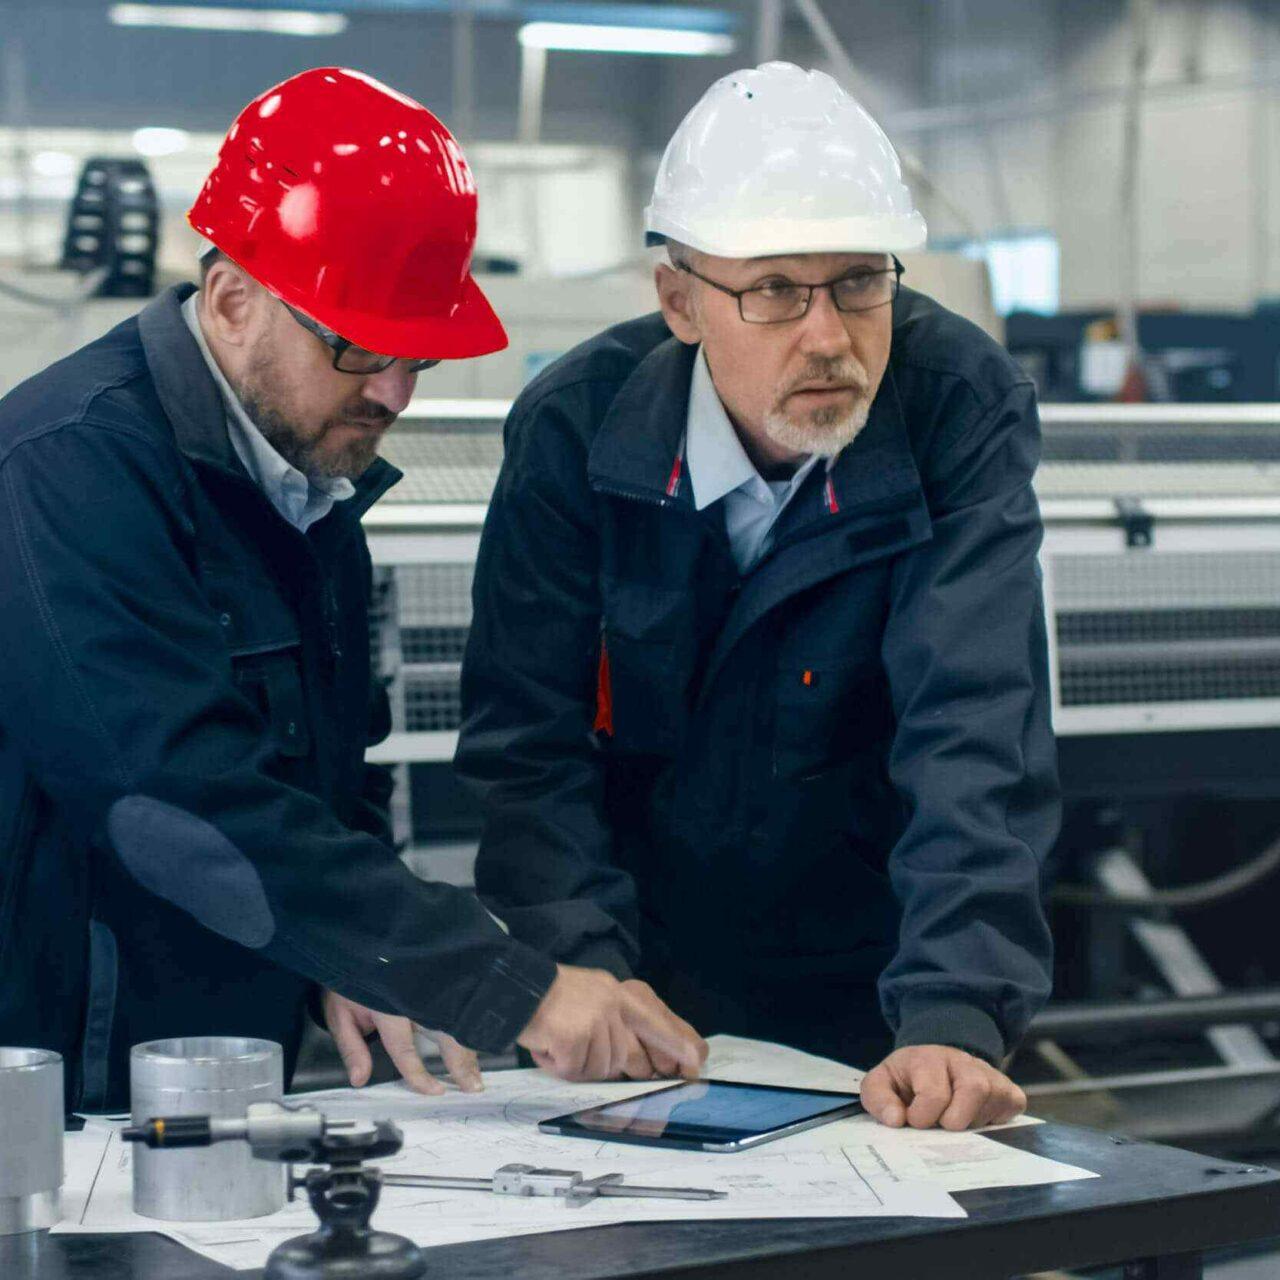 Building a factory